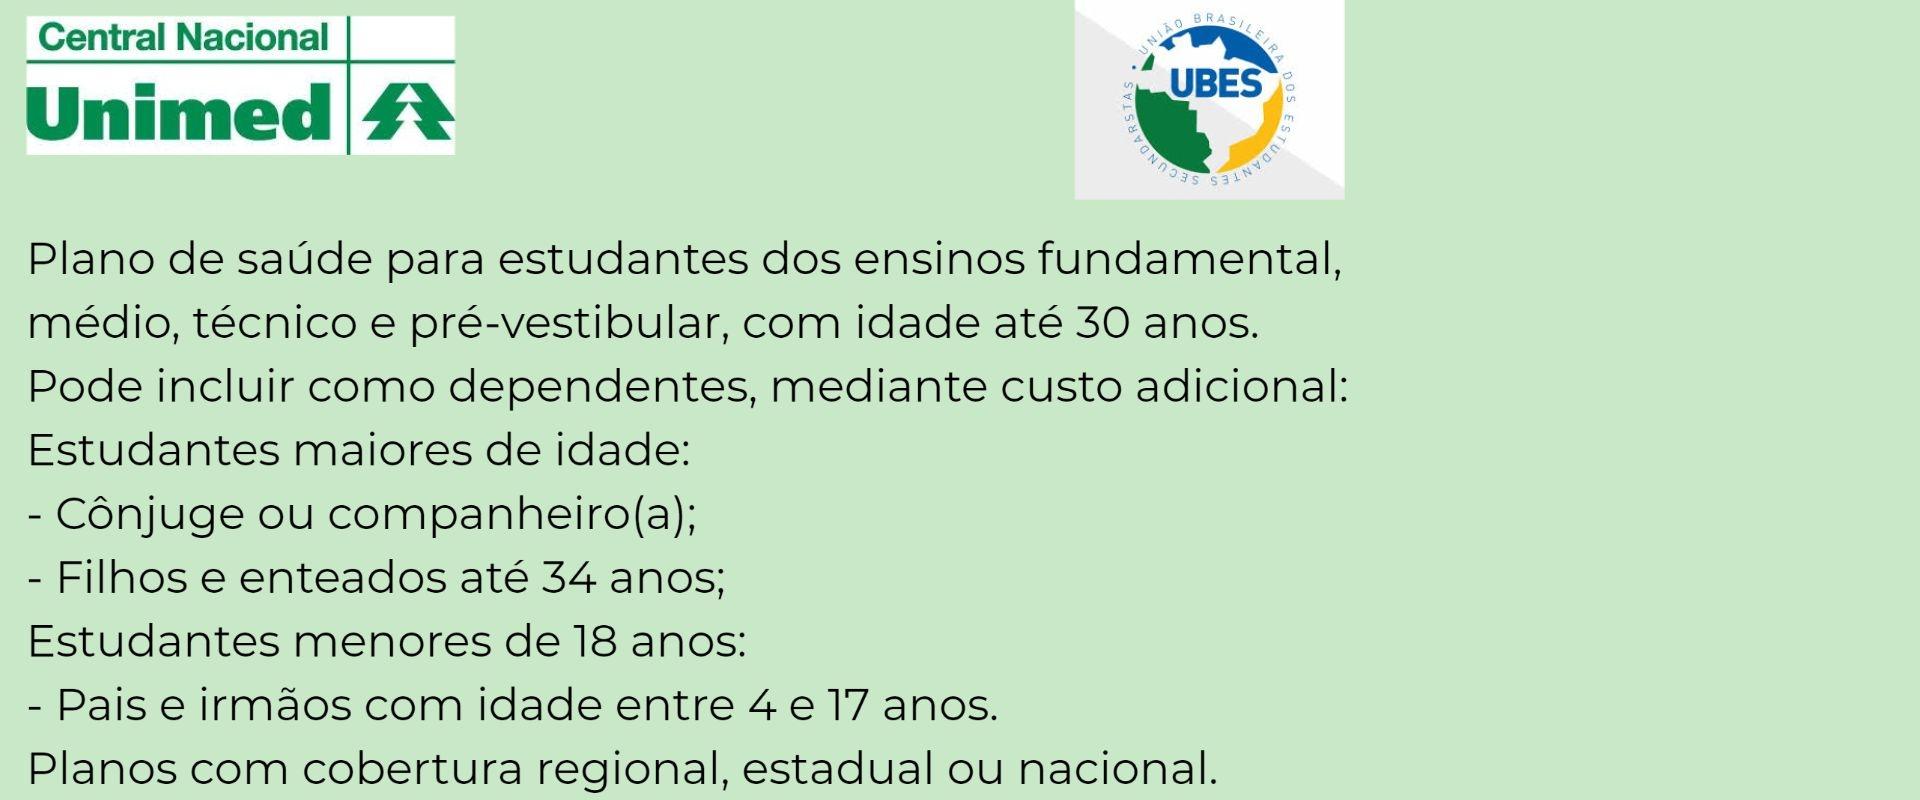 Unimed Estudantil UBES em Itabuna